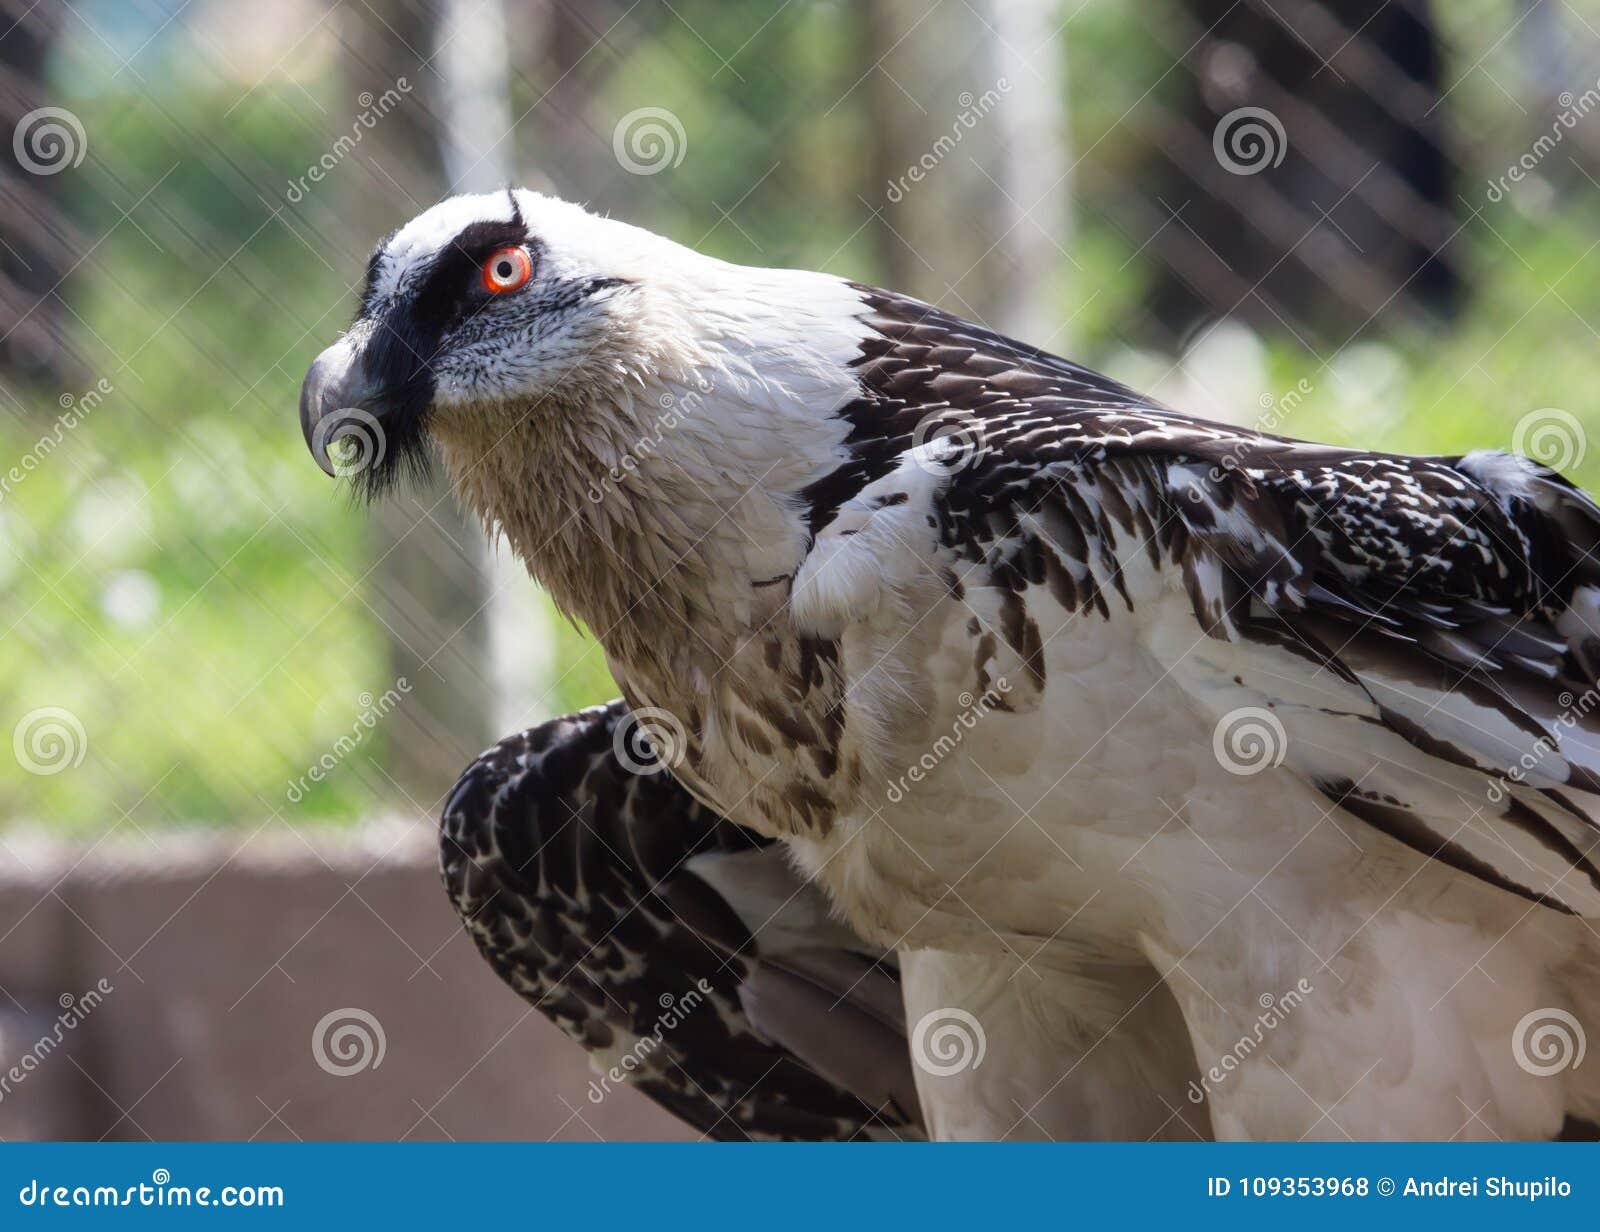 Portrait Of Bearded Vulture In Zoo Stock Photo Image Of Bird Bill